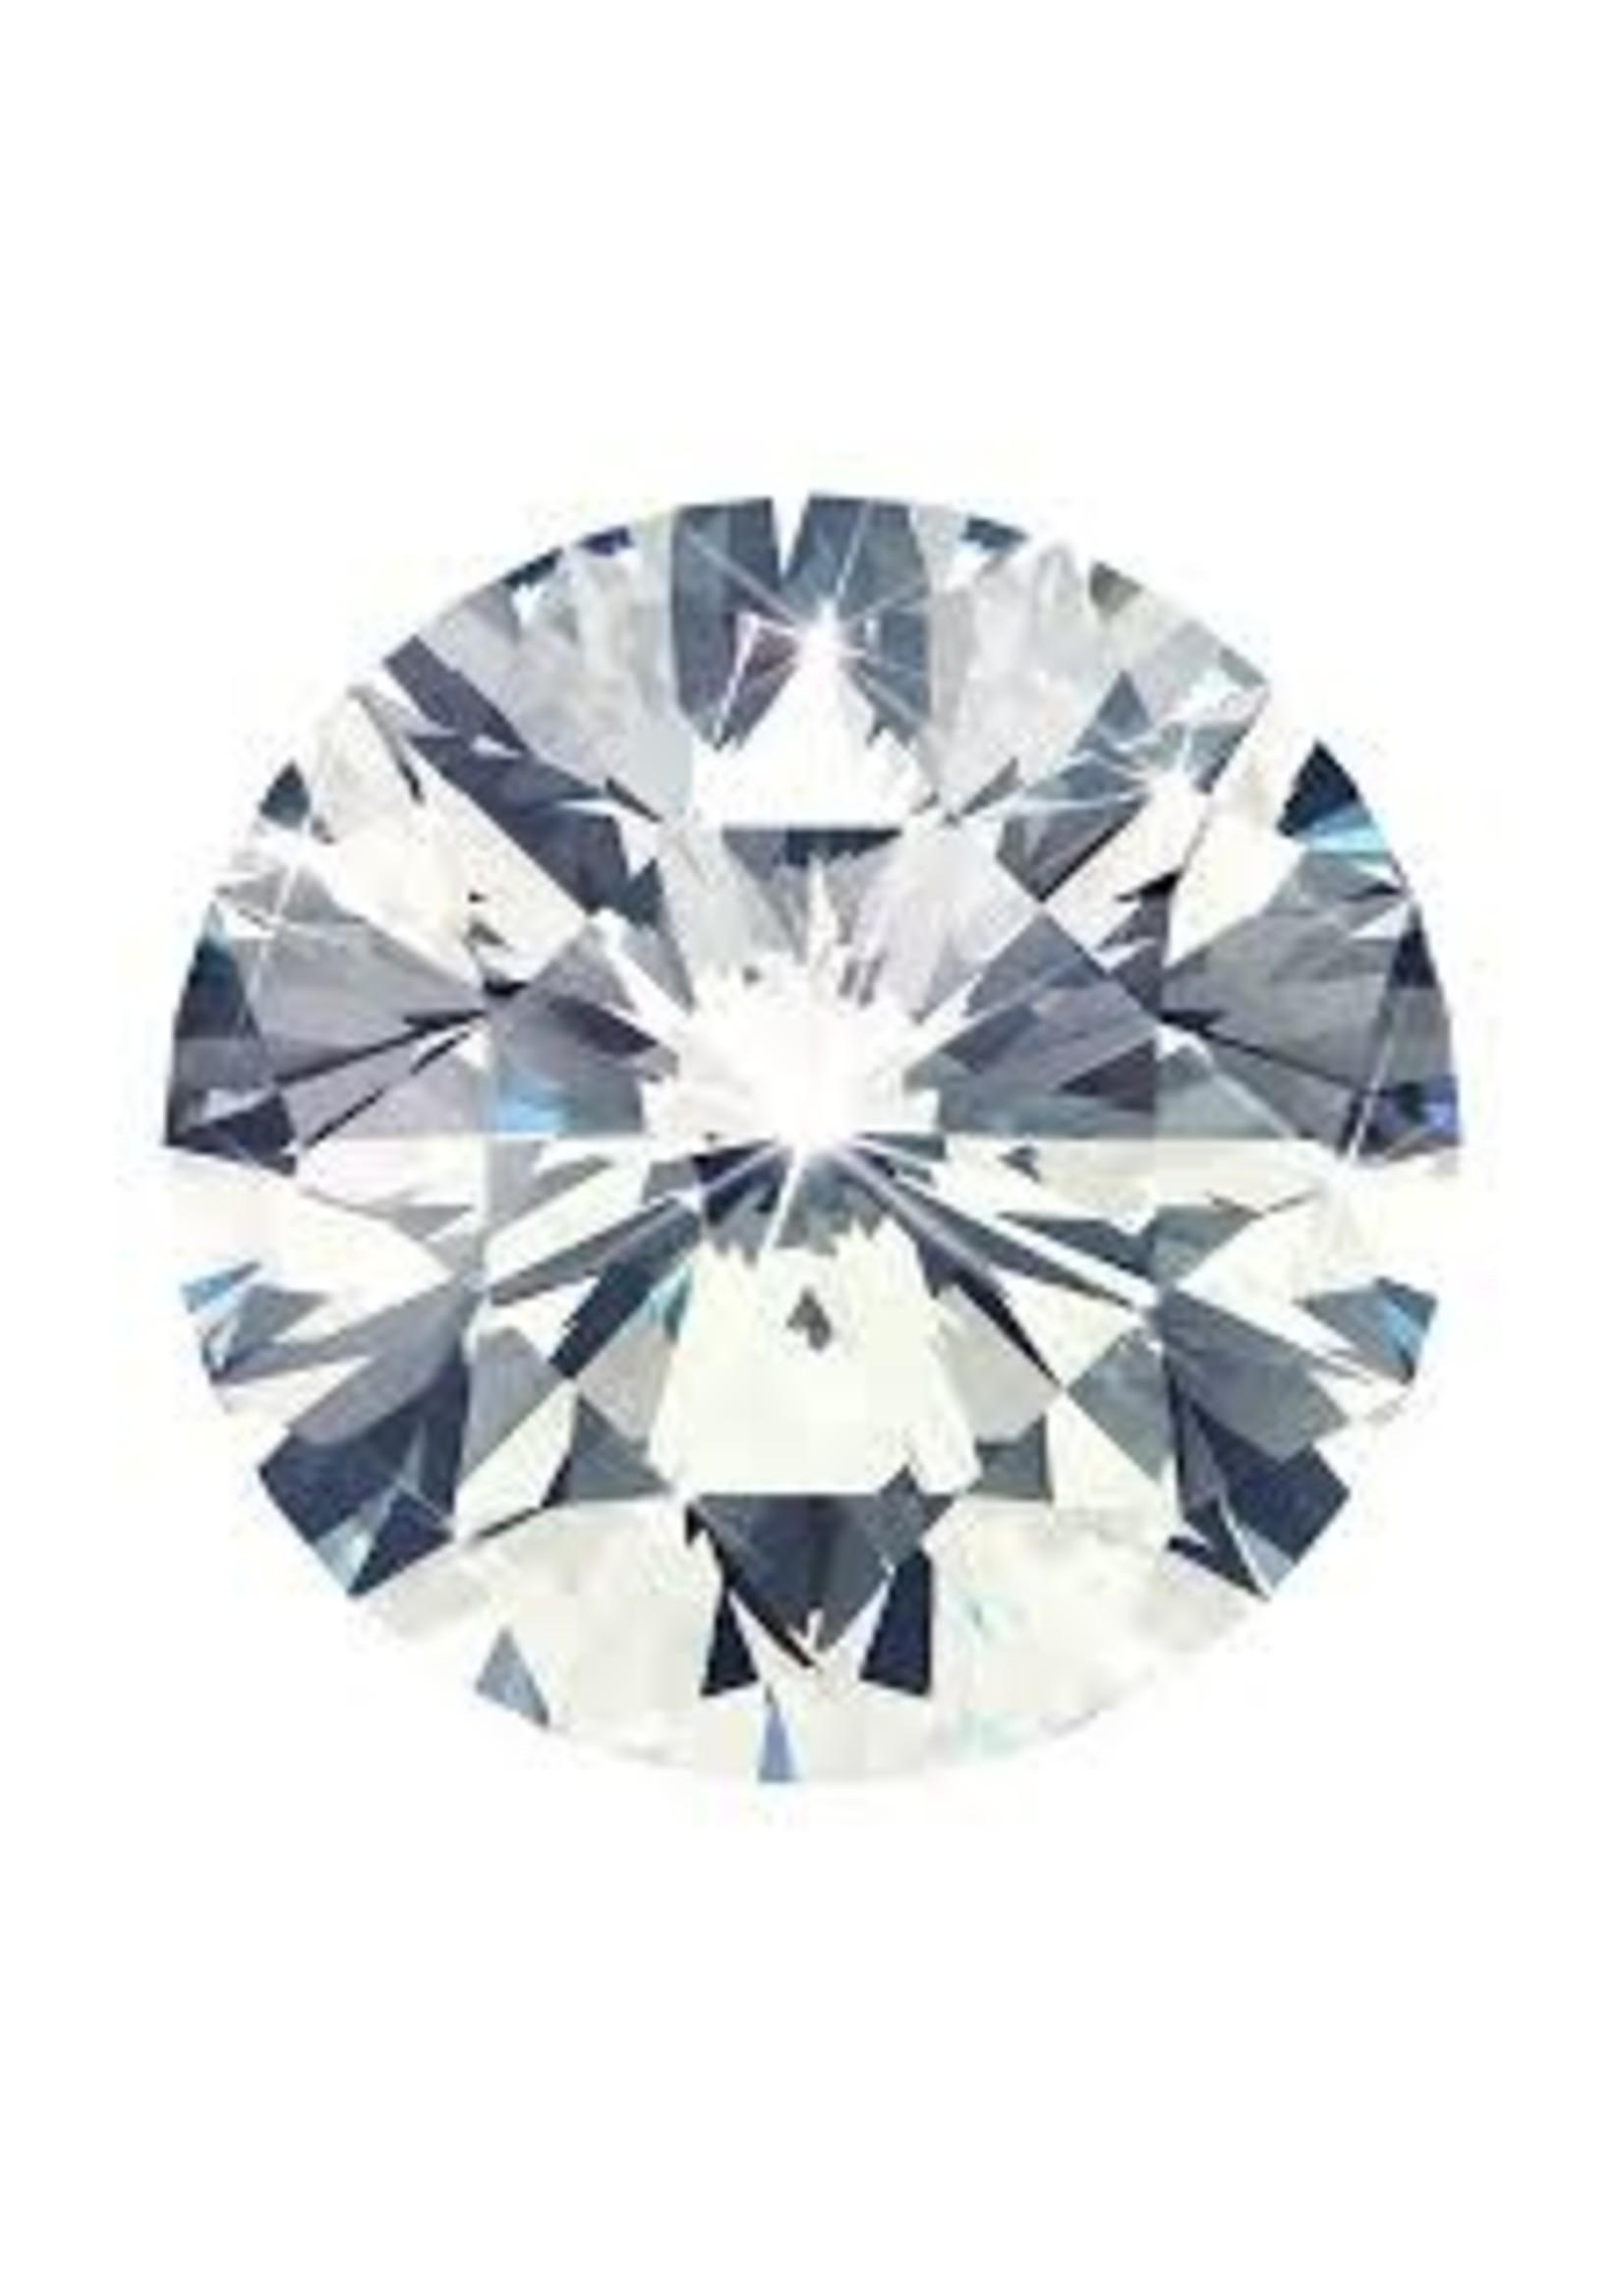 1.53CT ROUND BRILLIANT CUT DIAMOND (VS-2/G/VERY GOOD)